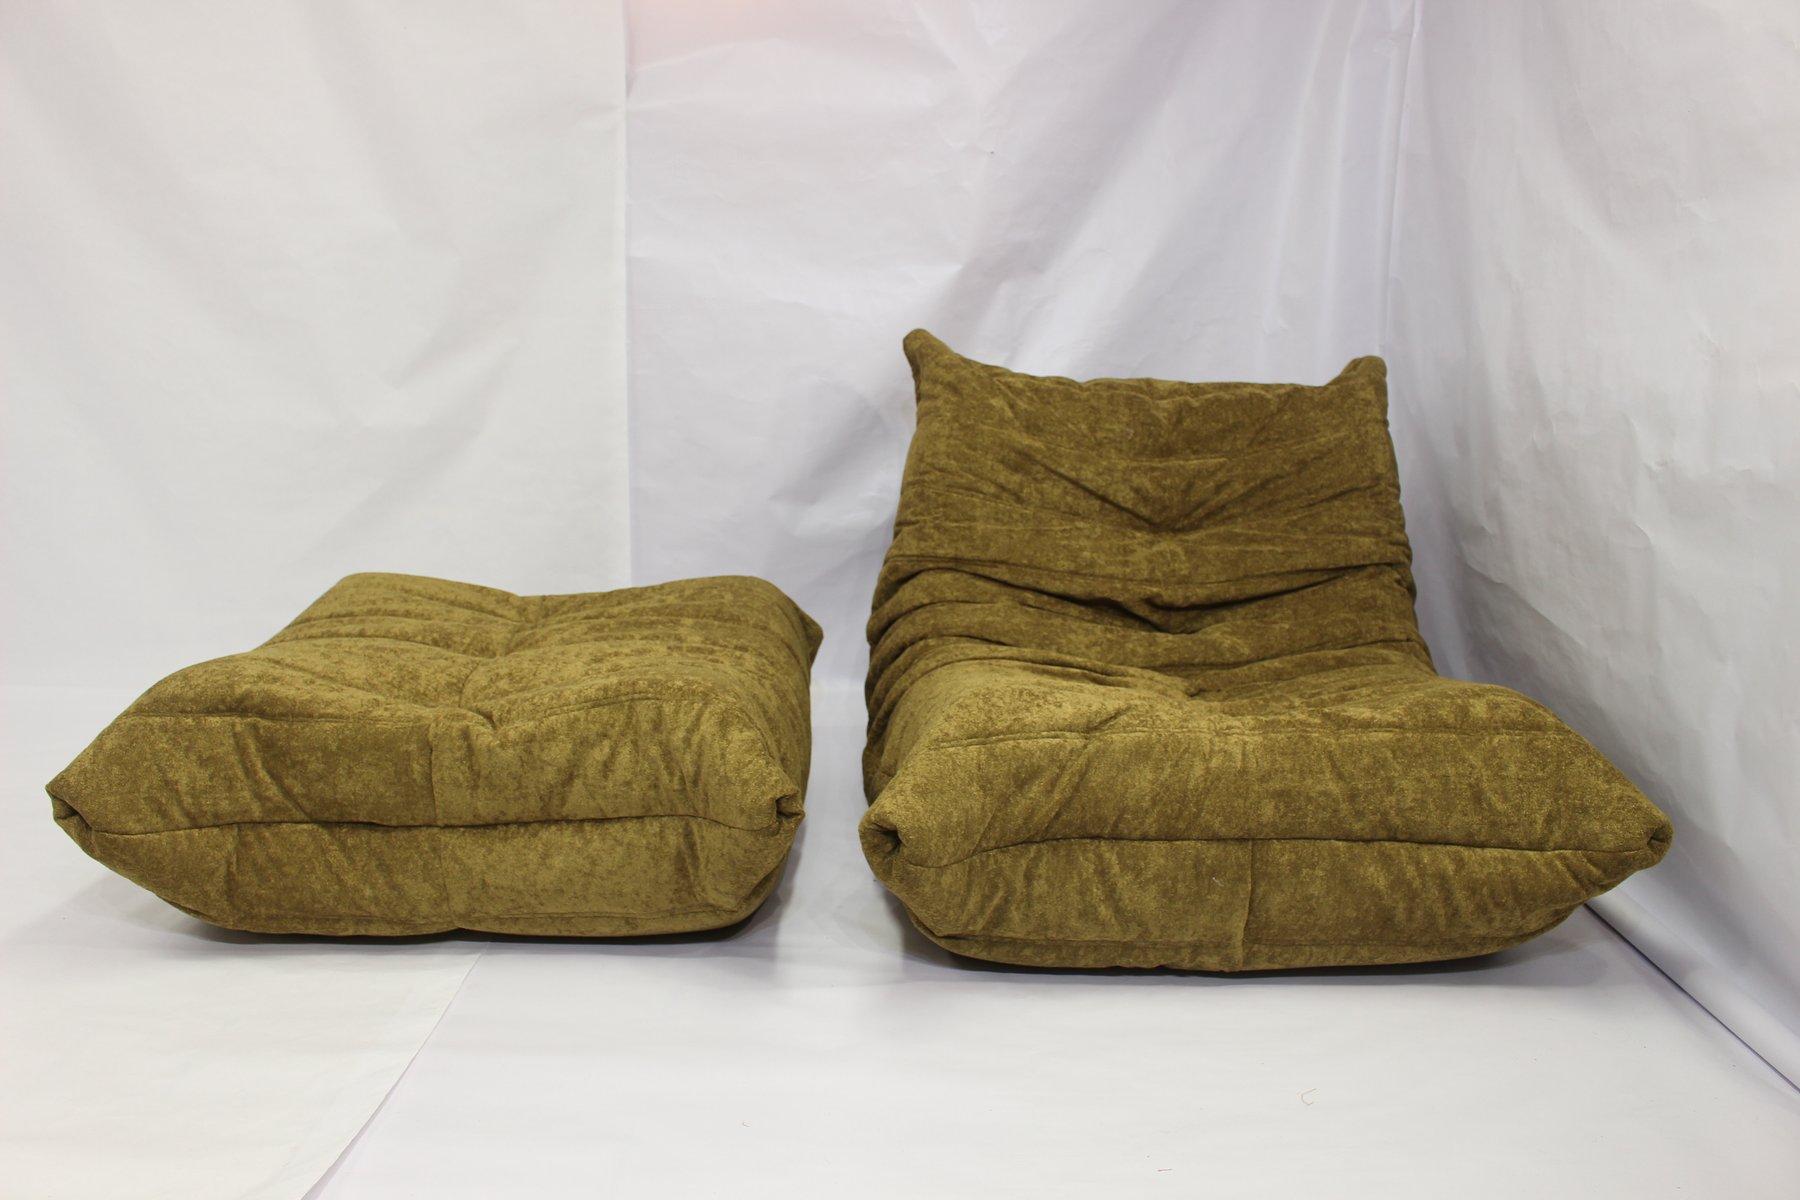 togo sessel fu hocker von michel ducaroy f r ligne roset 1970er bei pamono kaufen. Black Bedroom Furniture Sets. Home Design Ideas